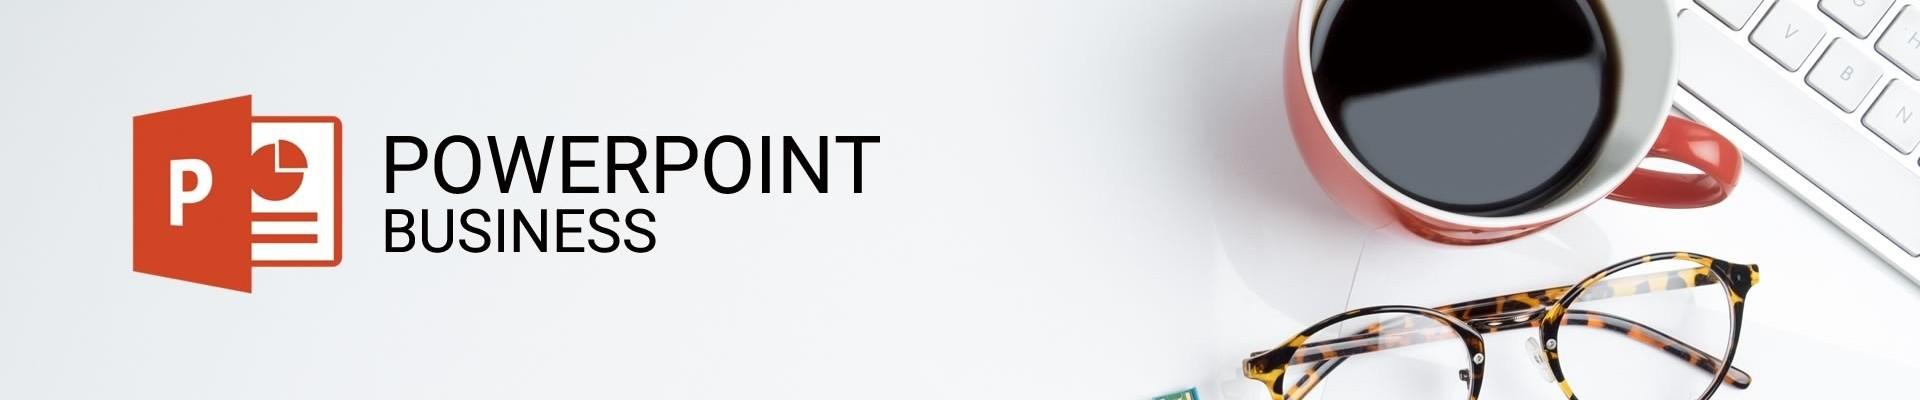 PowerPoint, poslovni